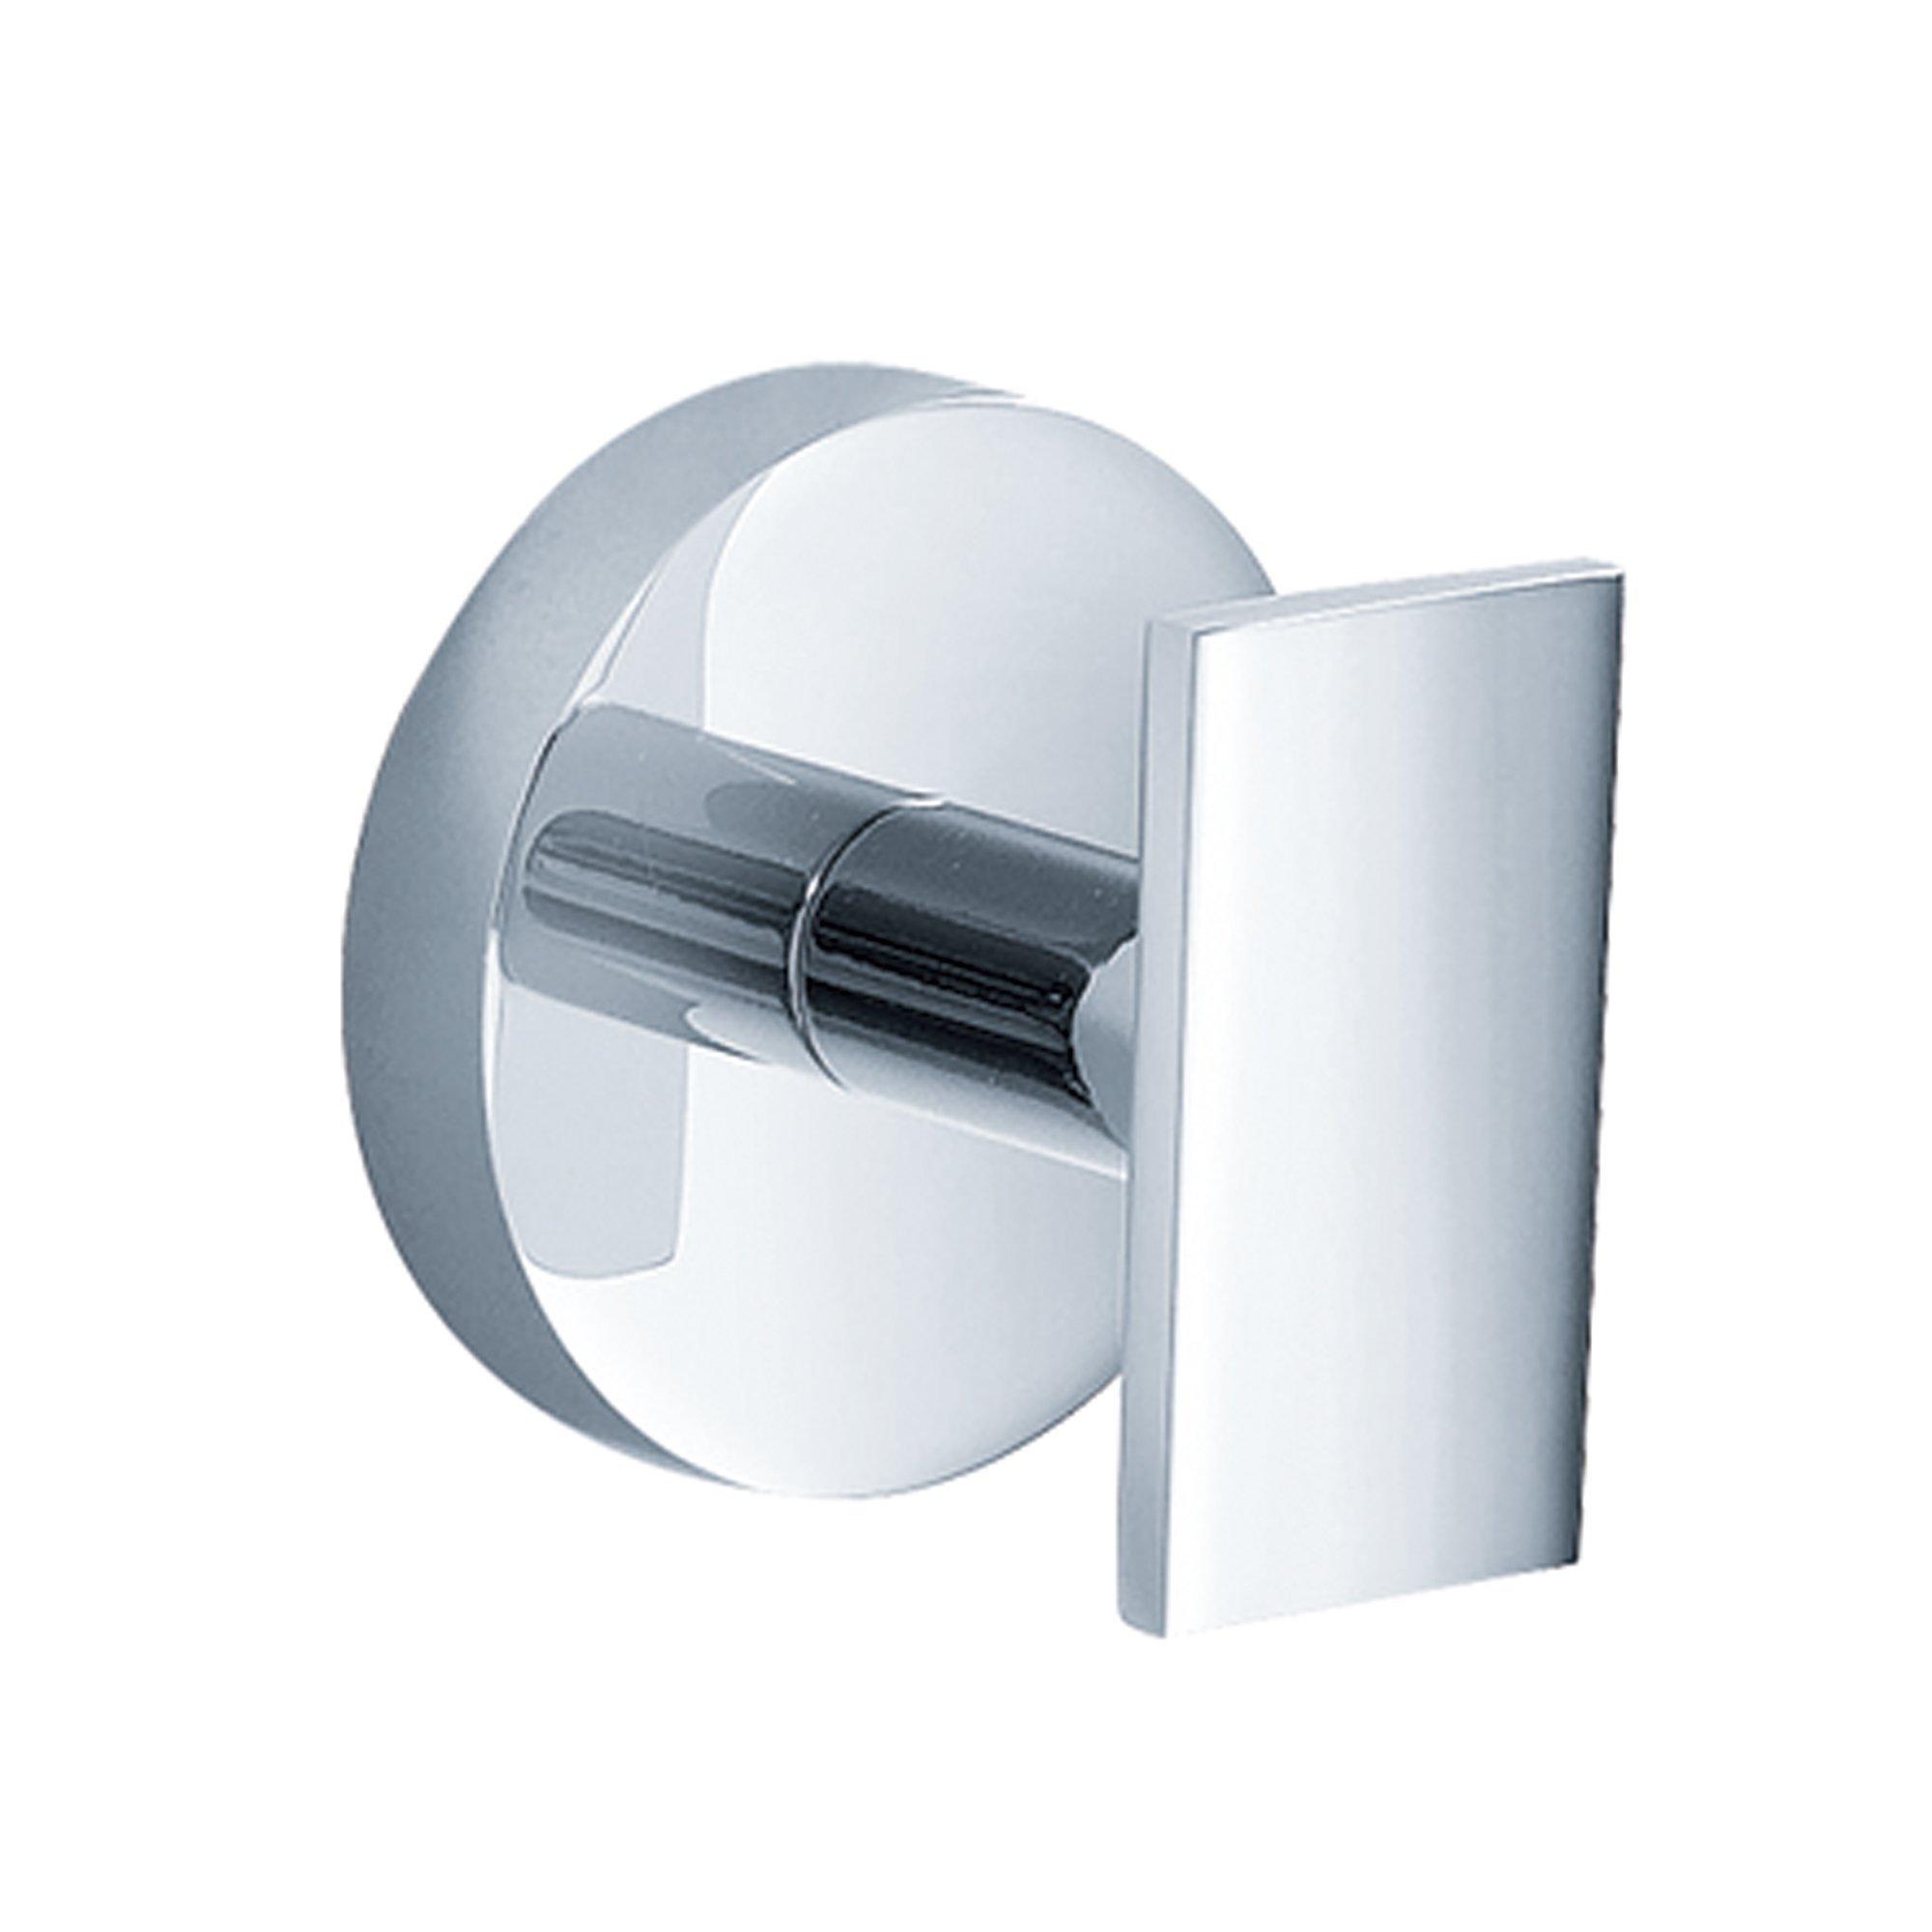 Kraus KEA-12201CH Imperium Bathroom Accessories - Hook by Kraus